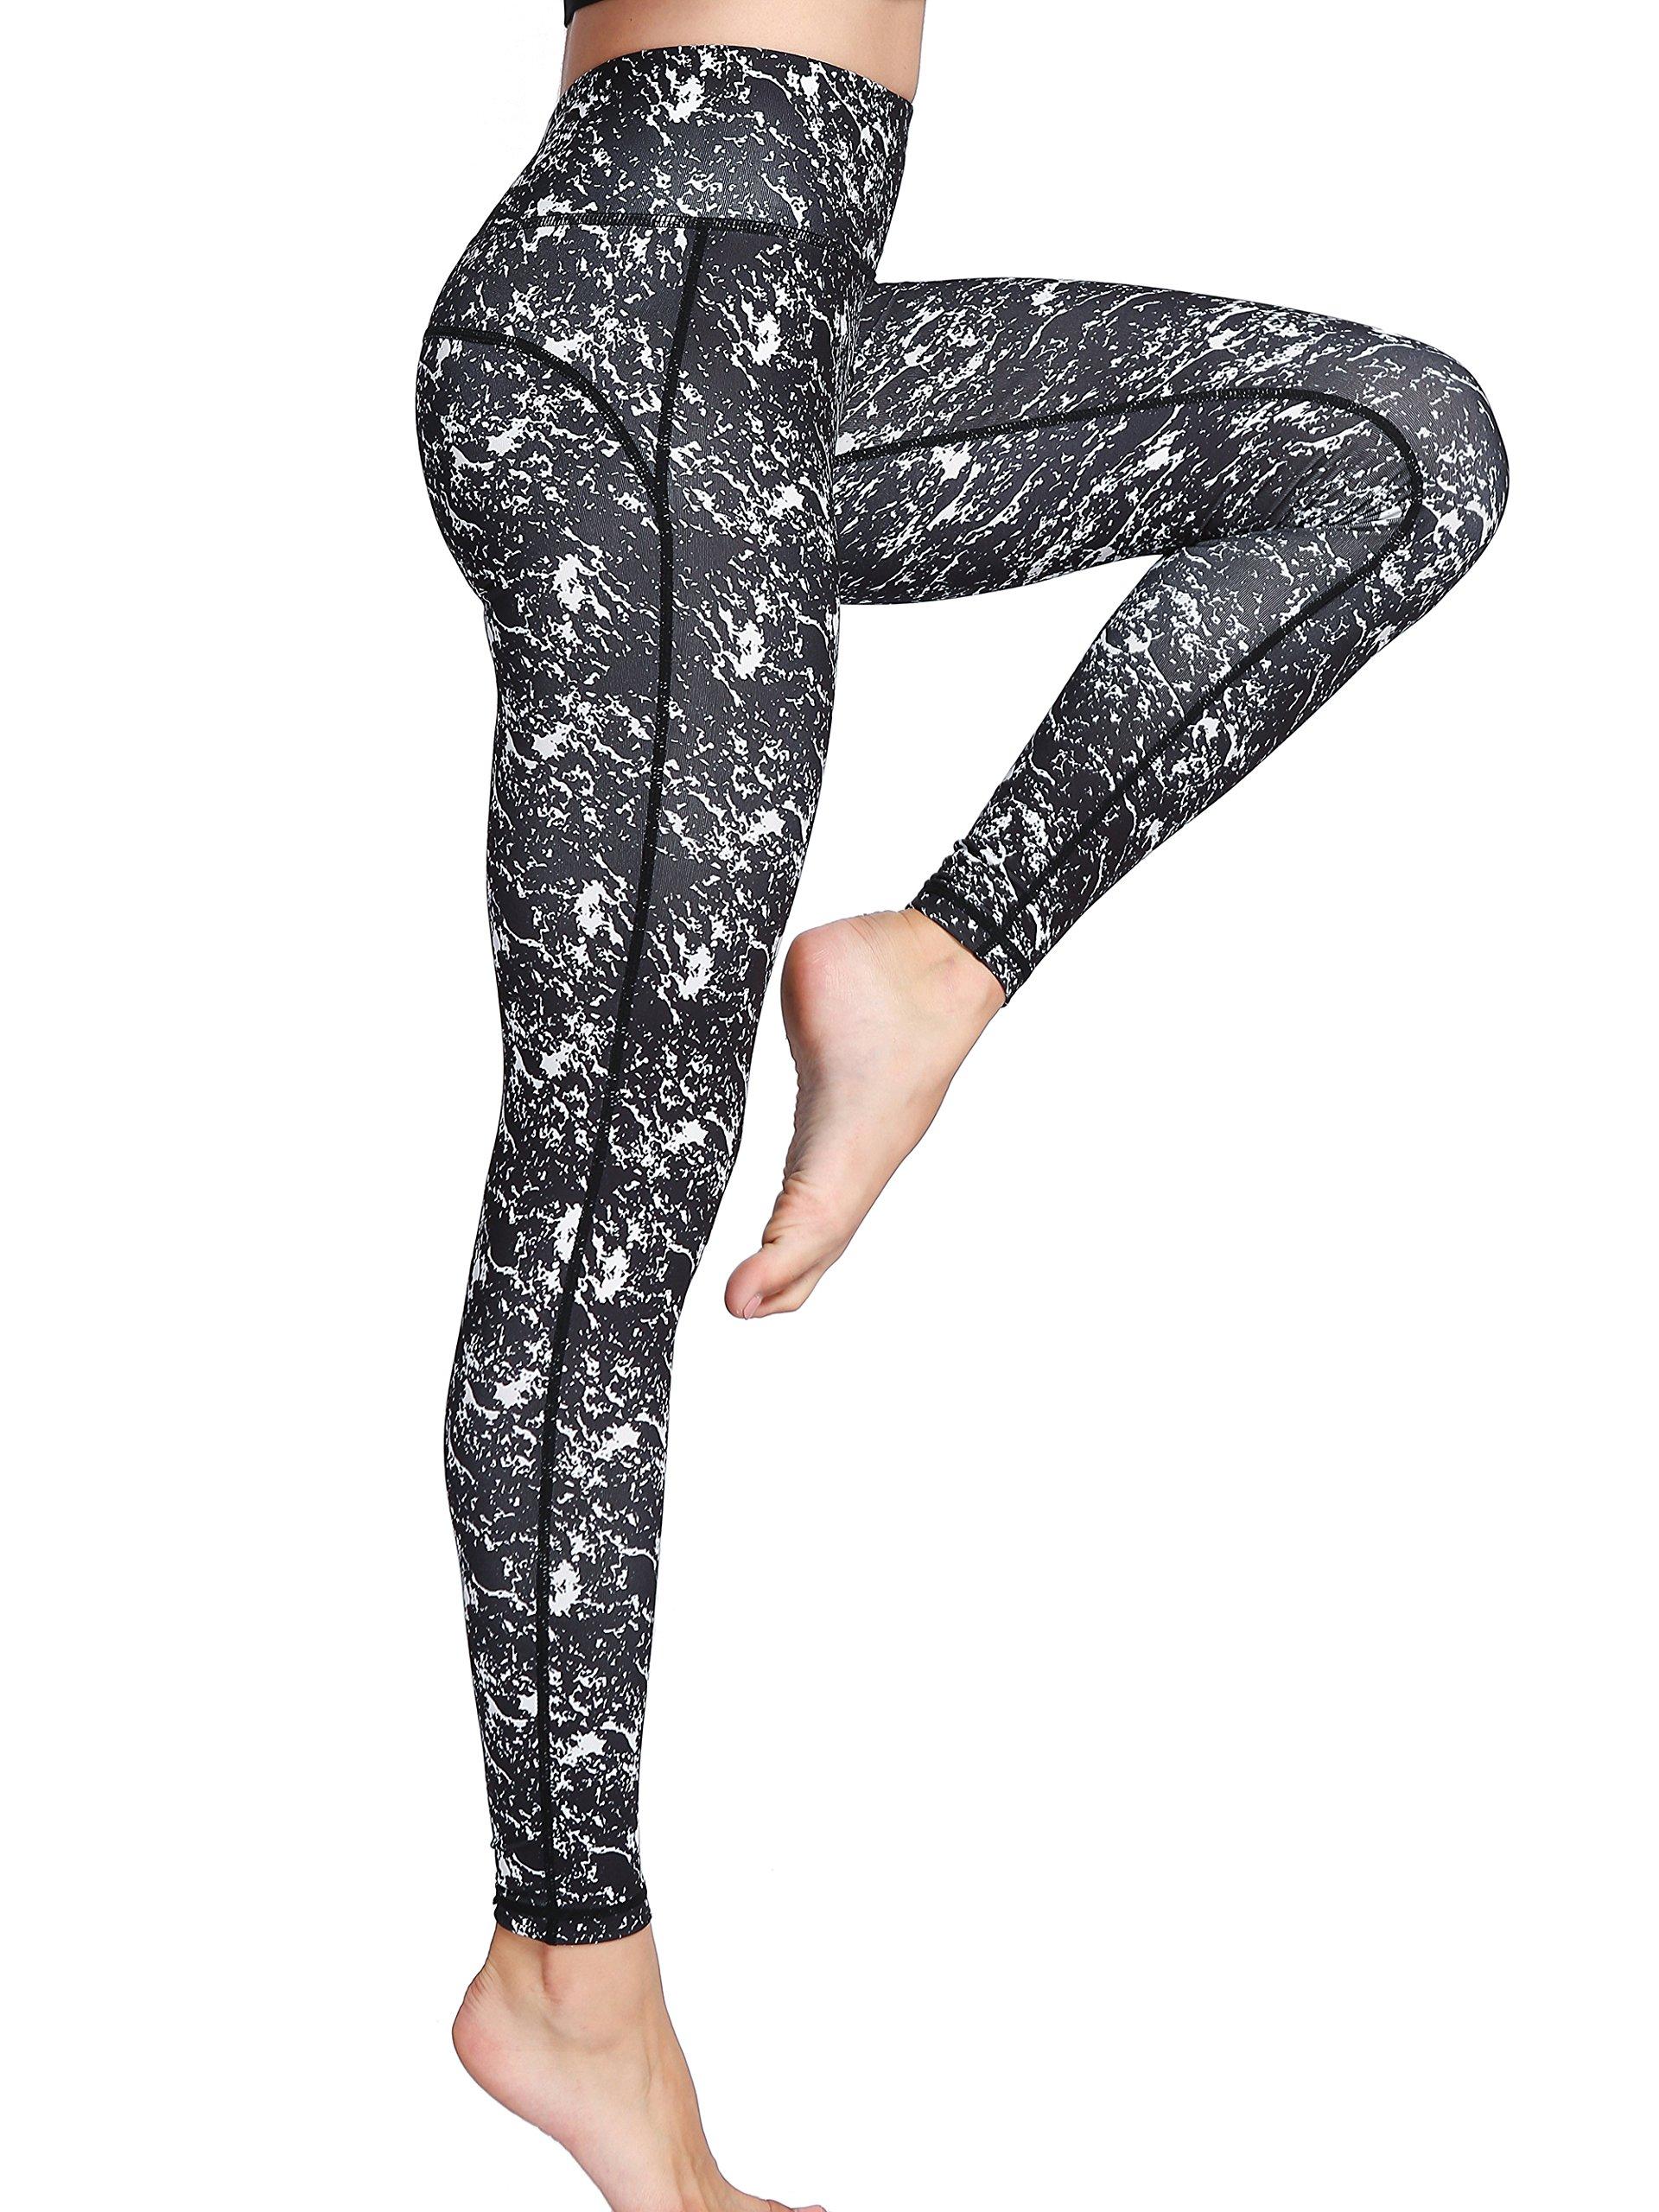 Womens Long Sports Leggings Running Tights High Waist Stretch Fitness Yoga Pants